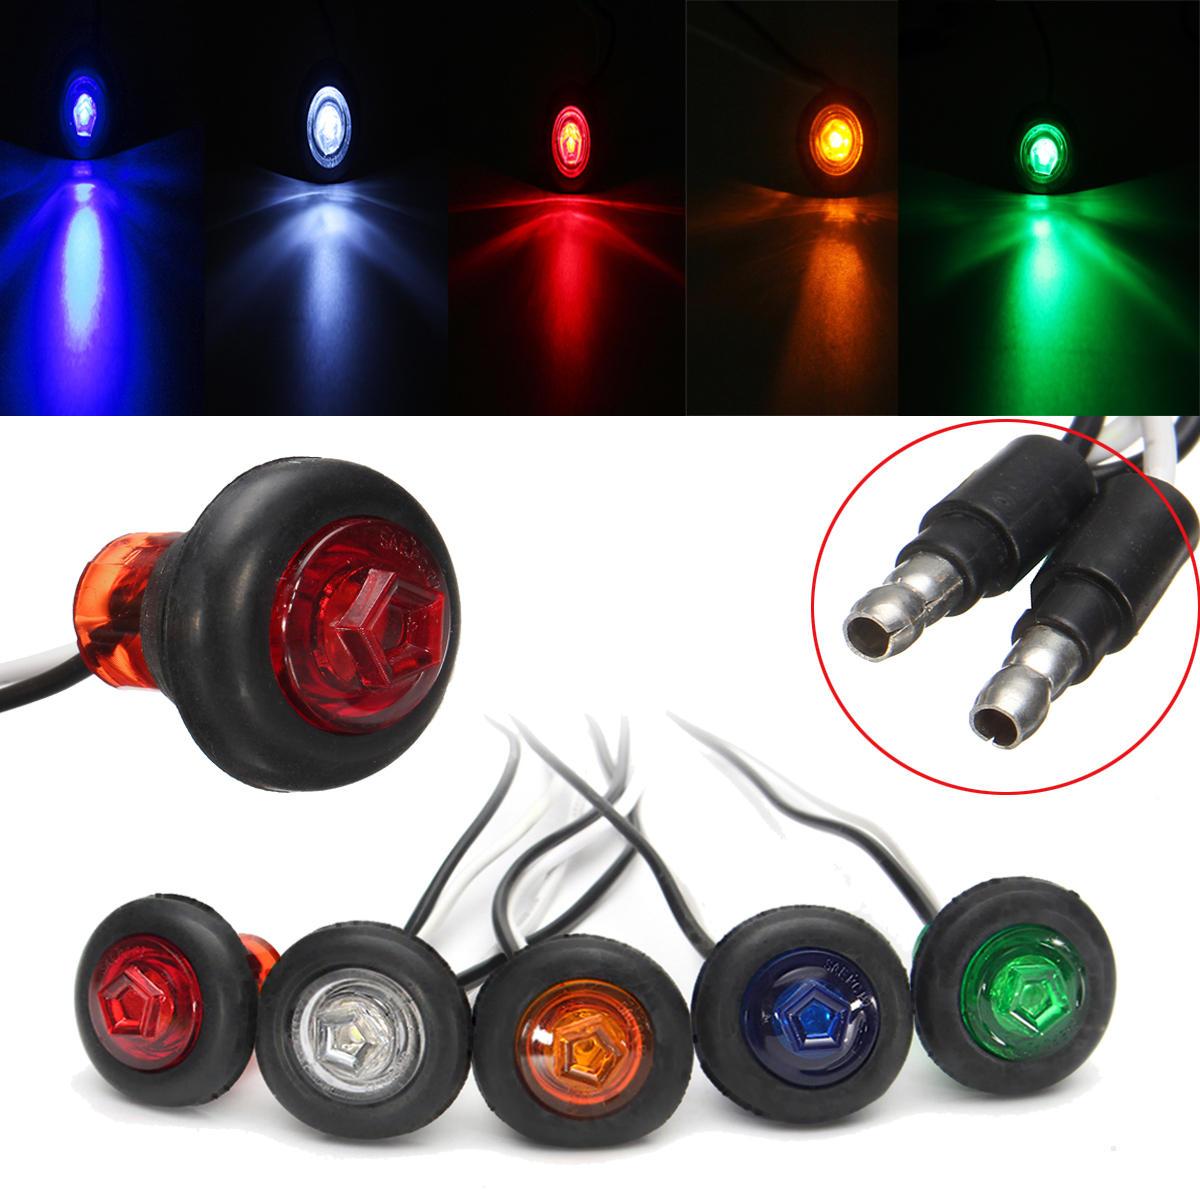 12 / 24V 3 / 4inch Perahu Penjemputan Truk Trailer LED Izin Side Marker Lampu Indikator Lampu